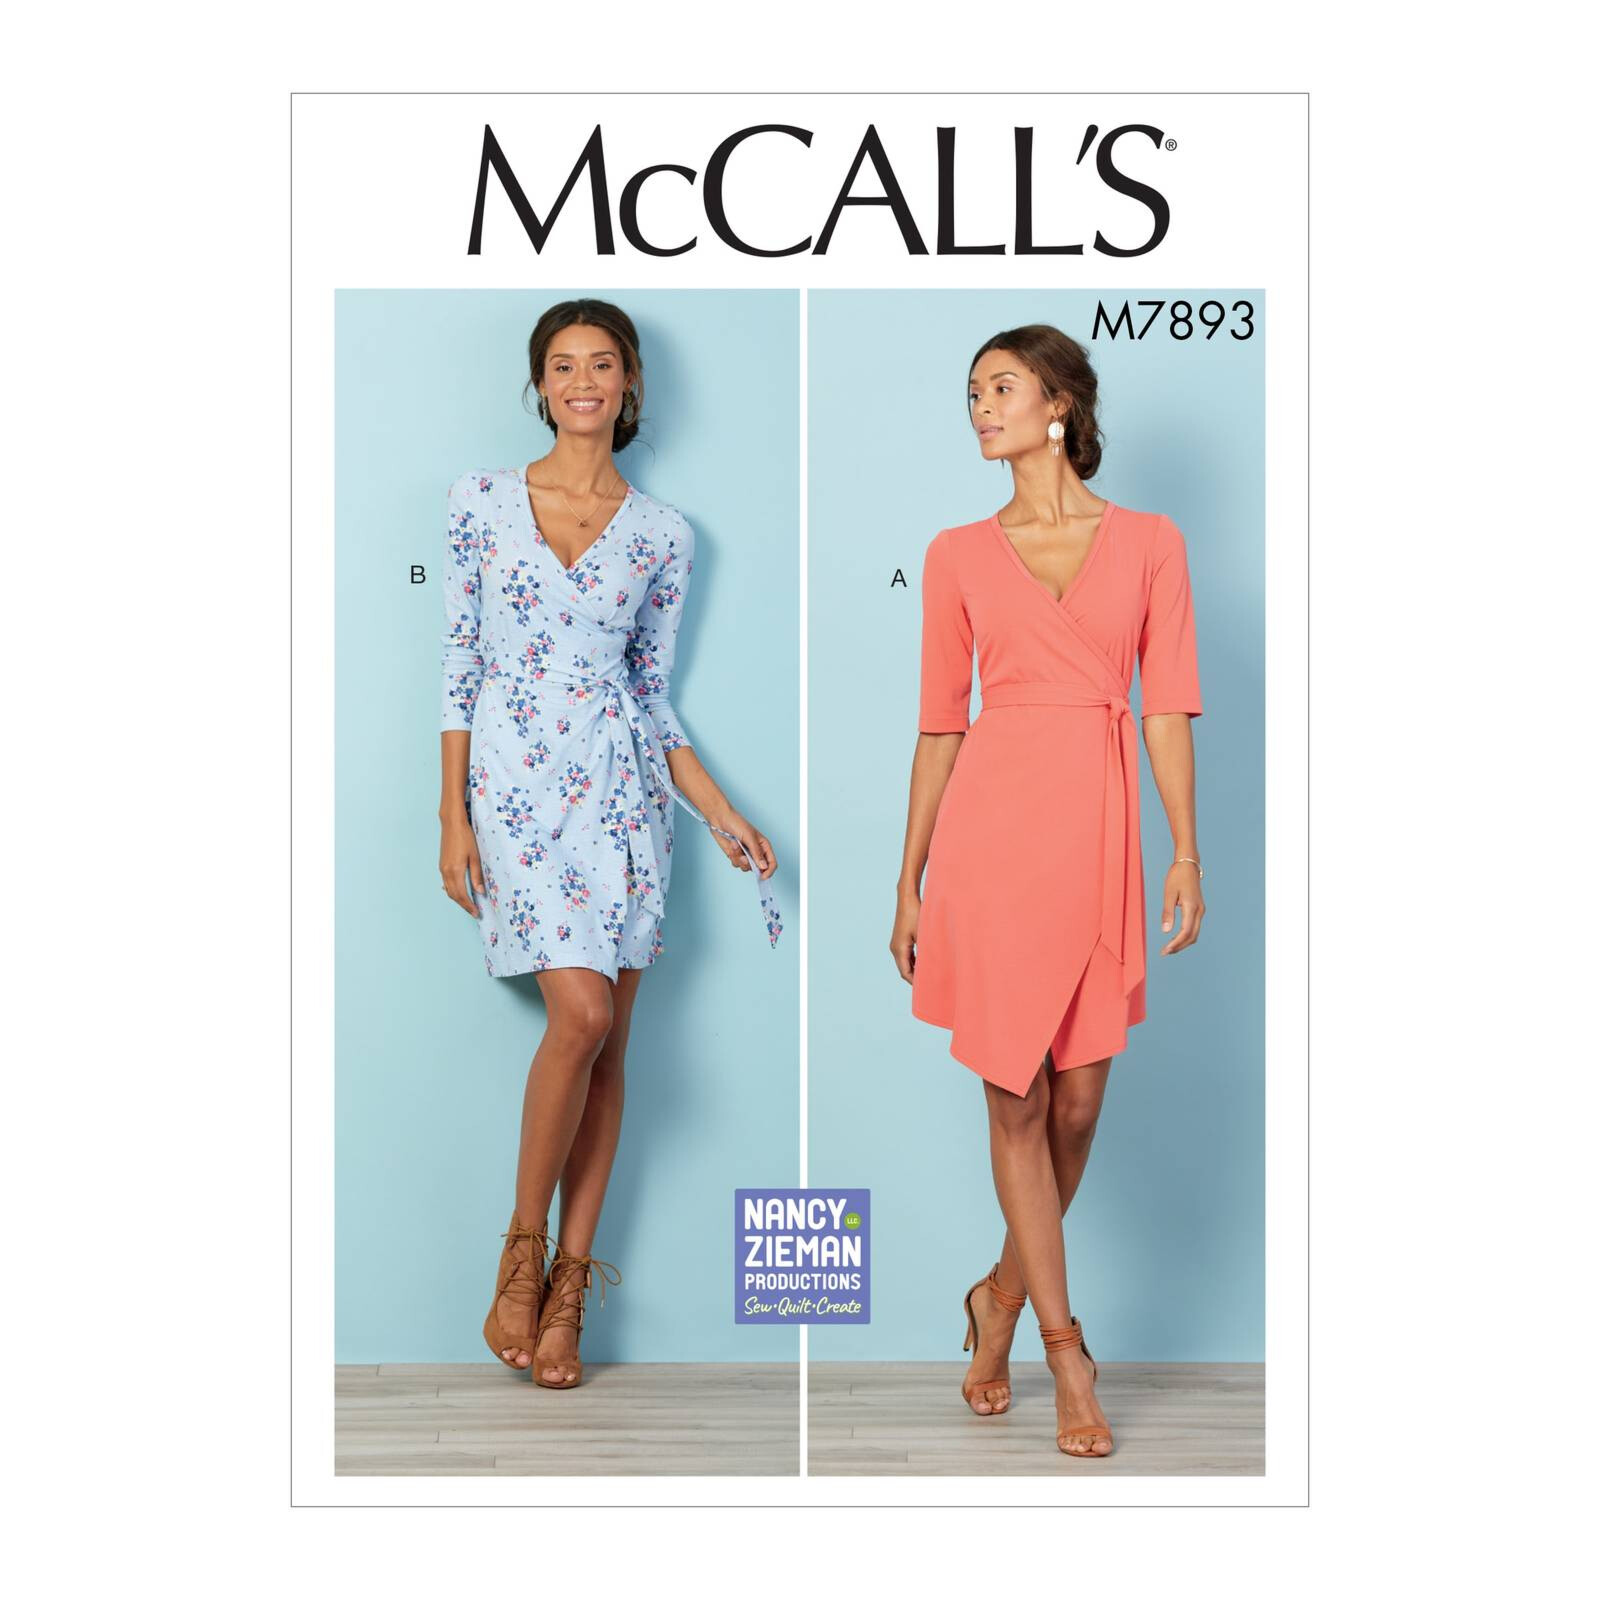 McCall's 7893